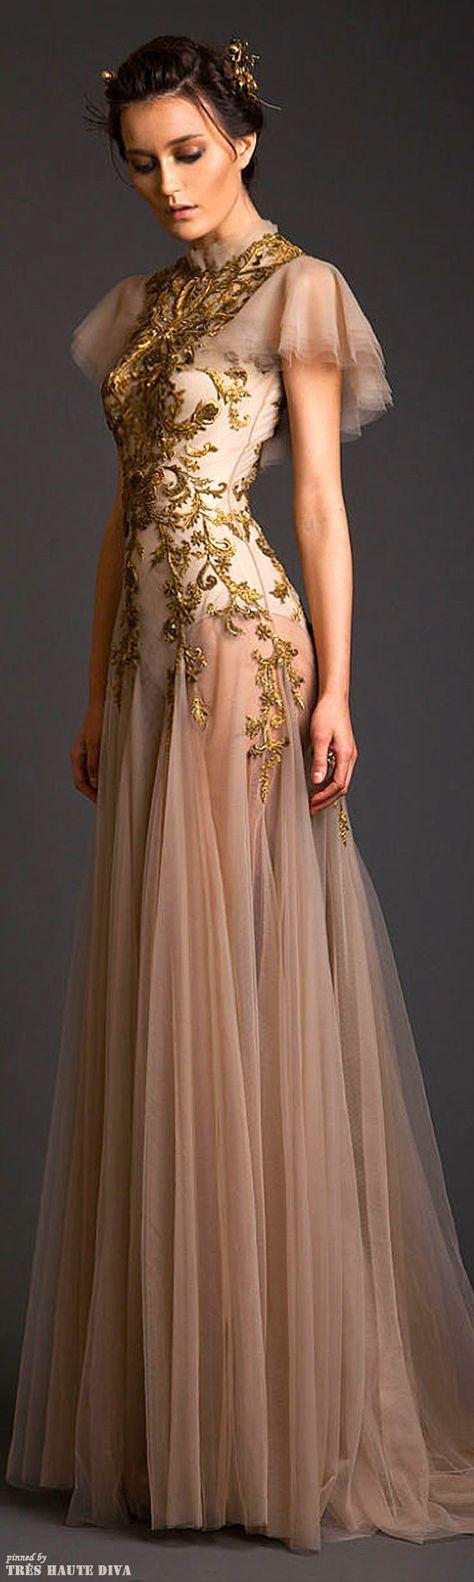 25 best Kleider images on Pinterest | Formal prom dresses, Art ...